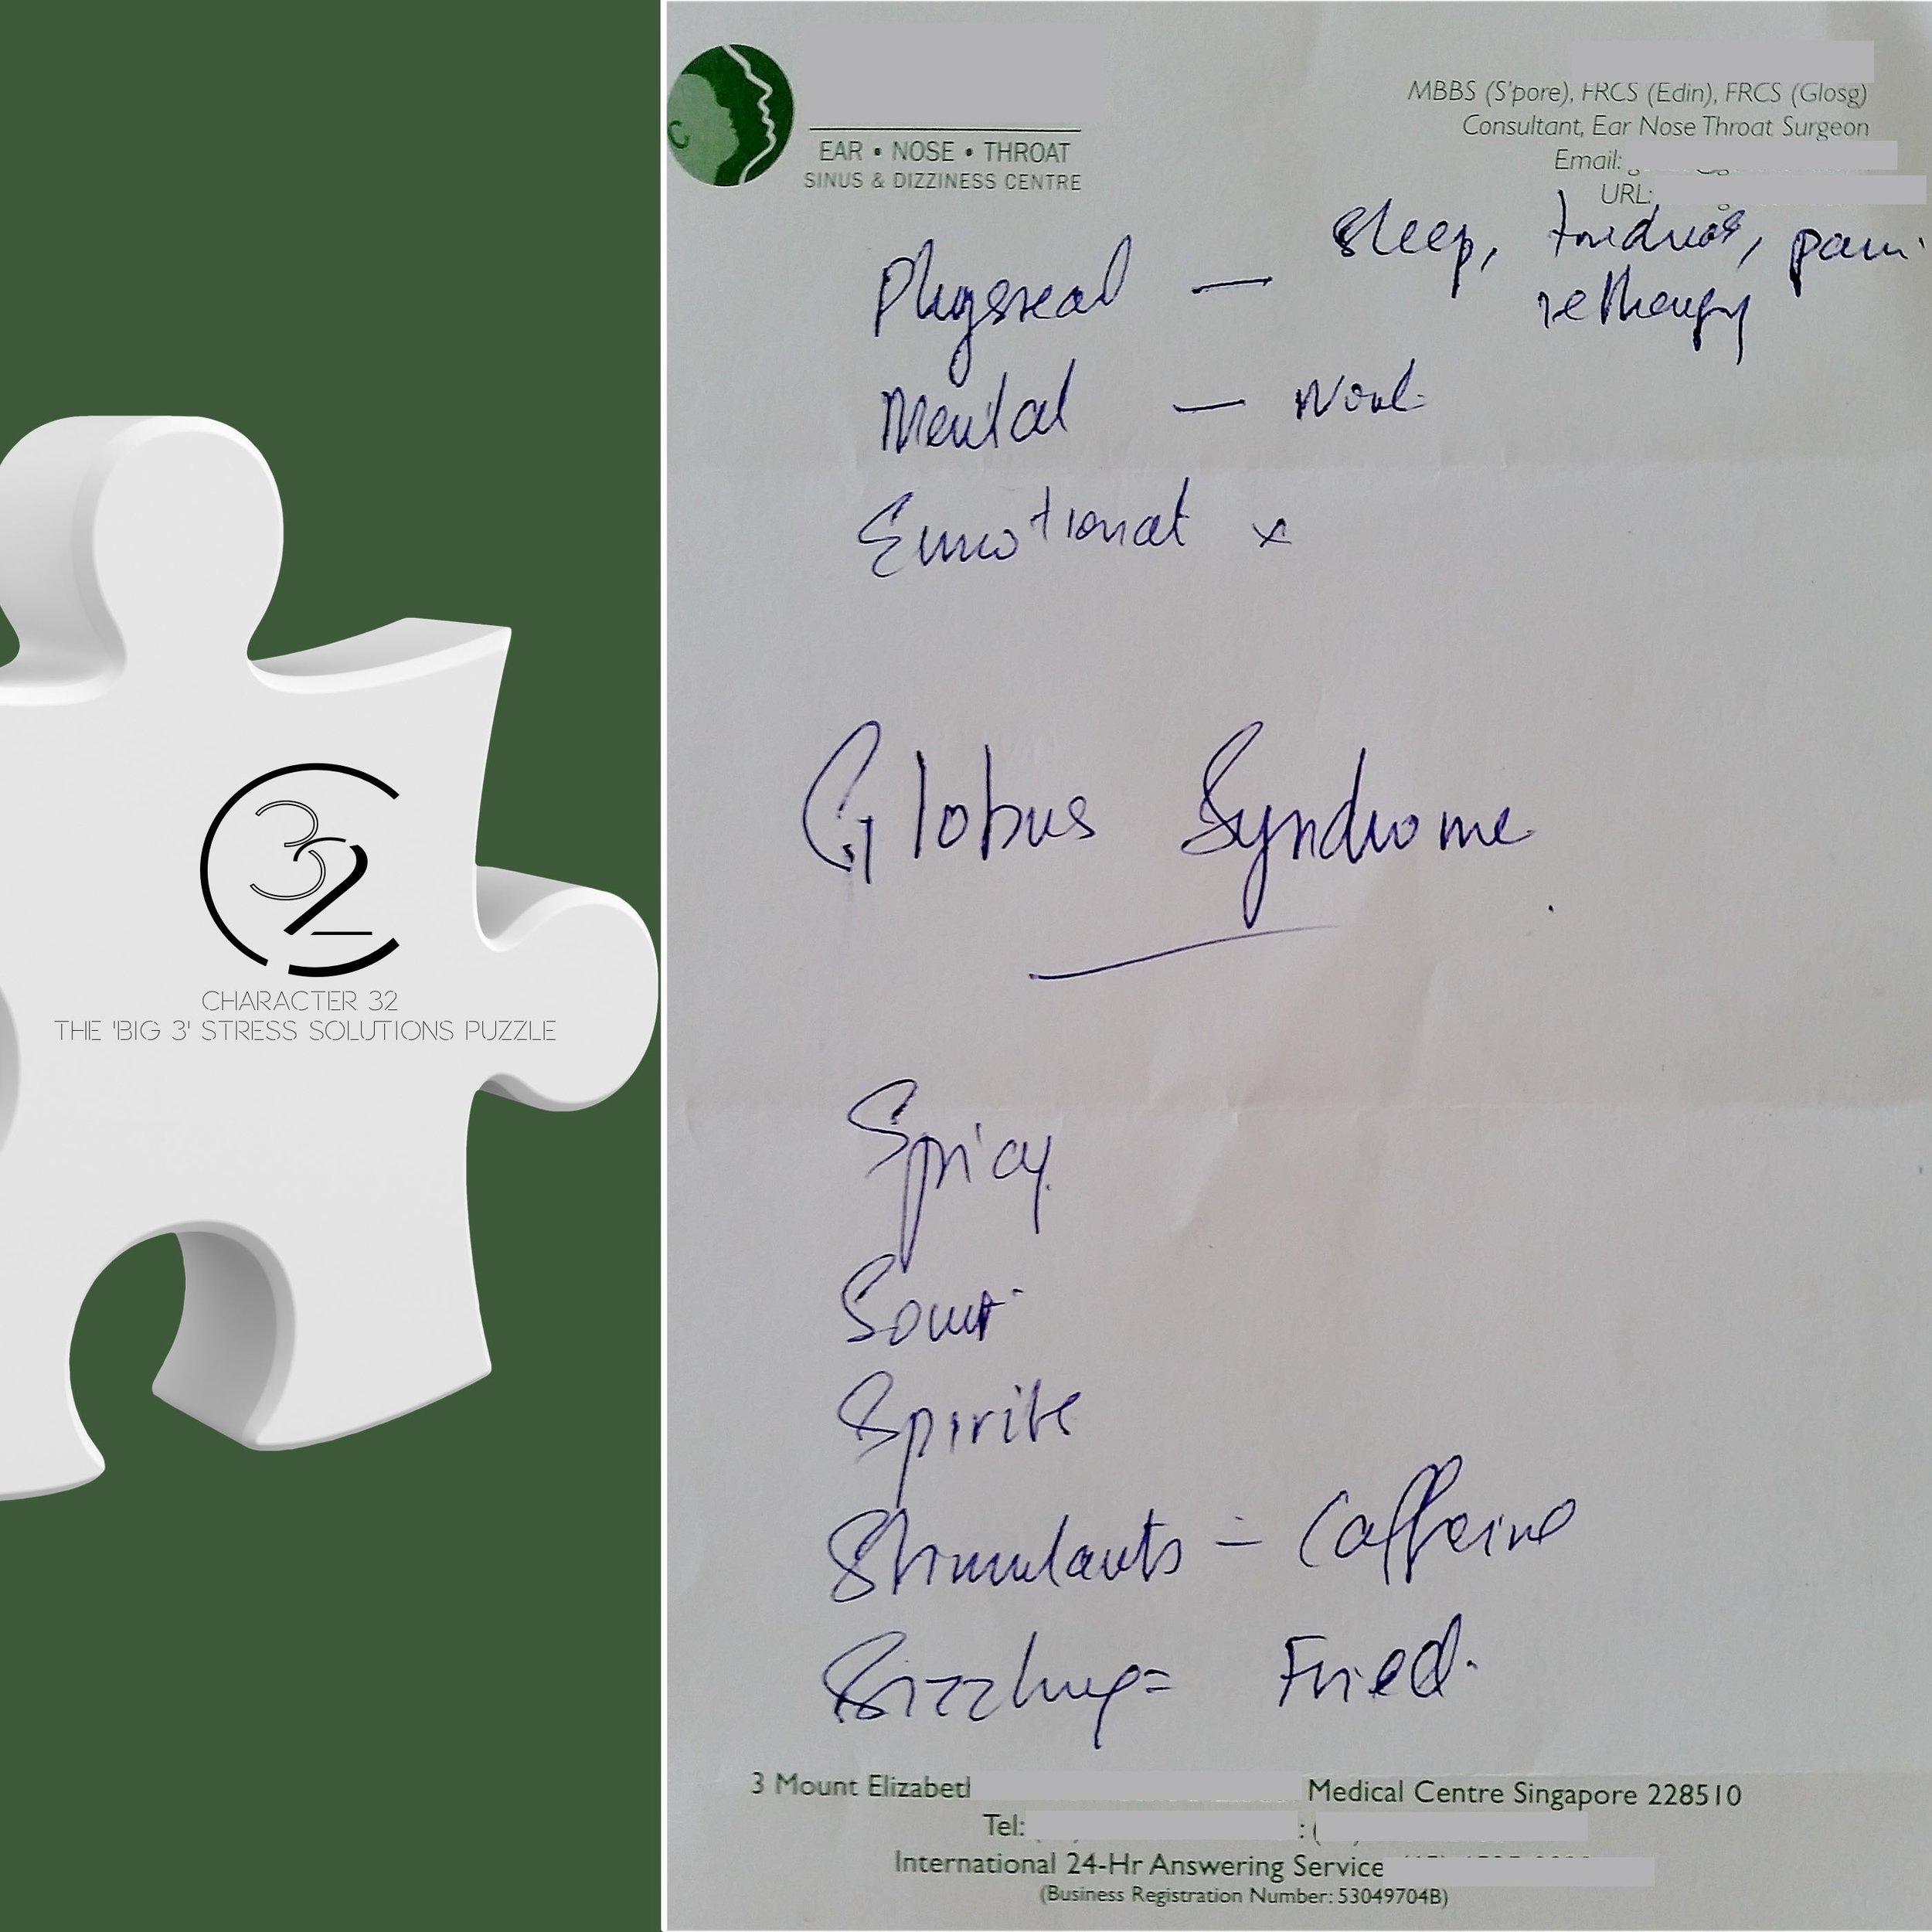 dysphagia-globus-syndrome-character-32-c32-the-big-3-stress-management-puzzle-tb3.jpeg